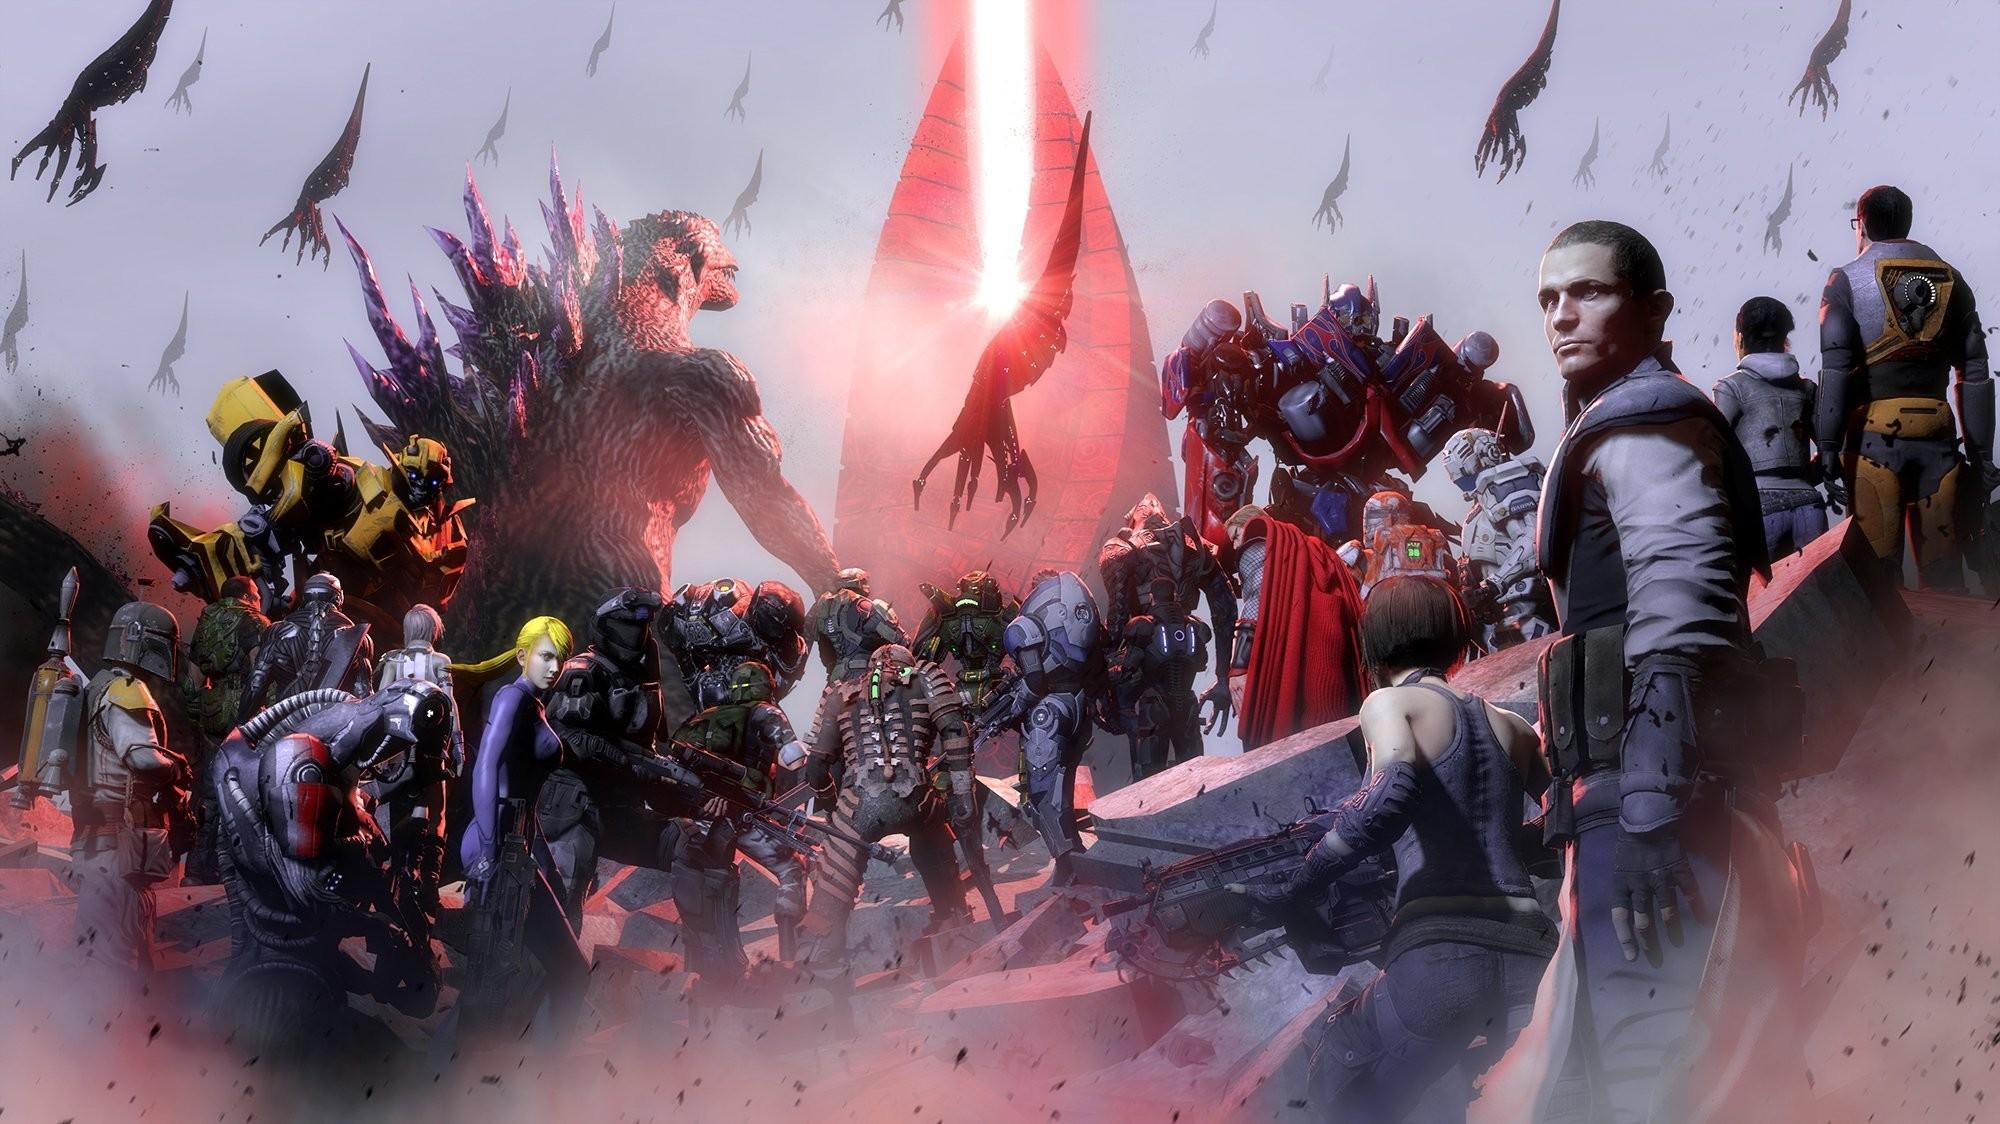 bumblebee geth thor legion star wars the force unleashed starkiller garrus  vakarian mass effect dead space